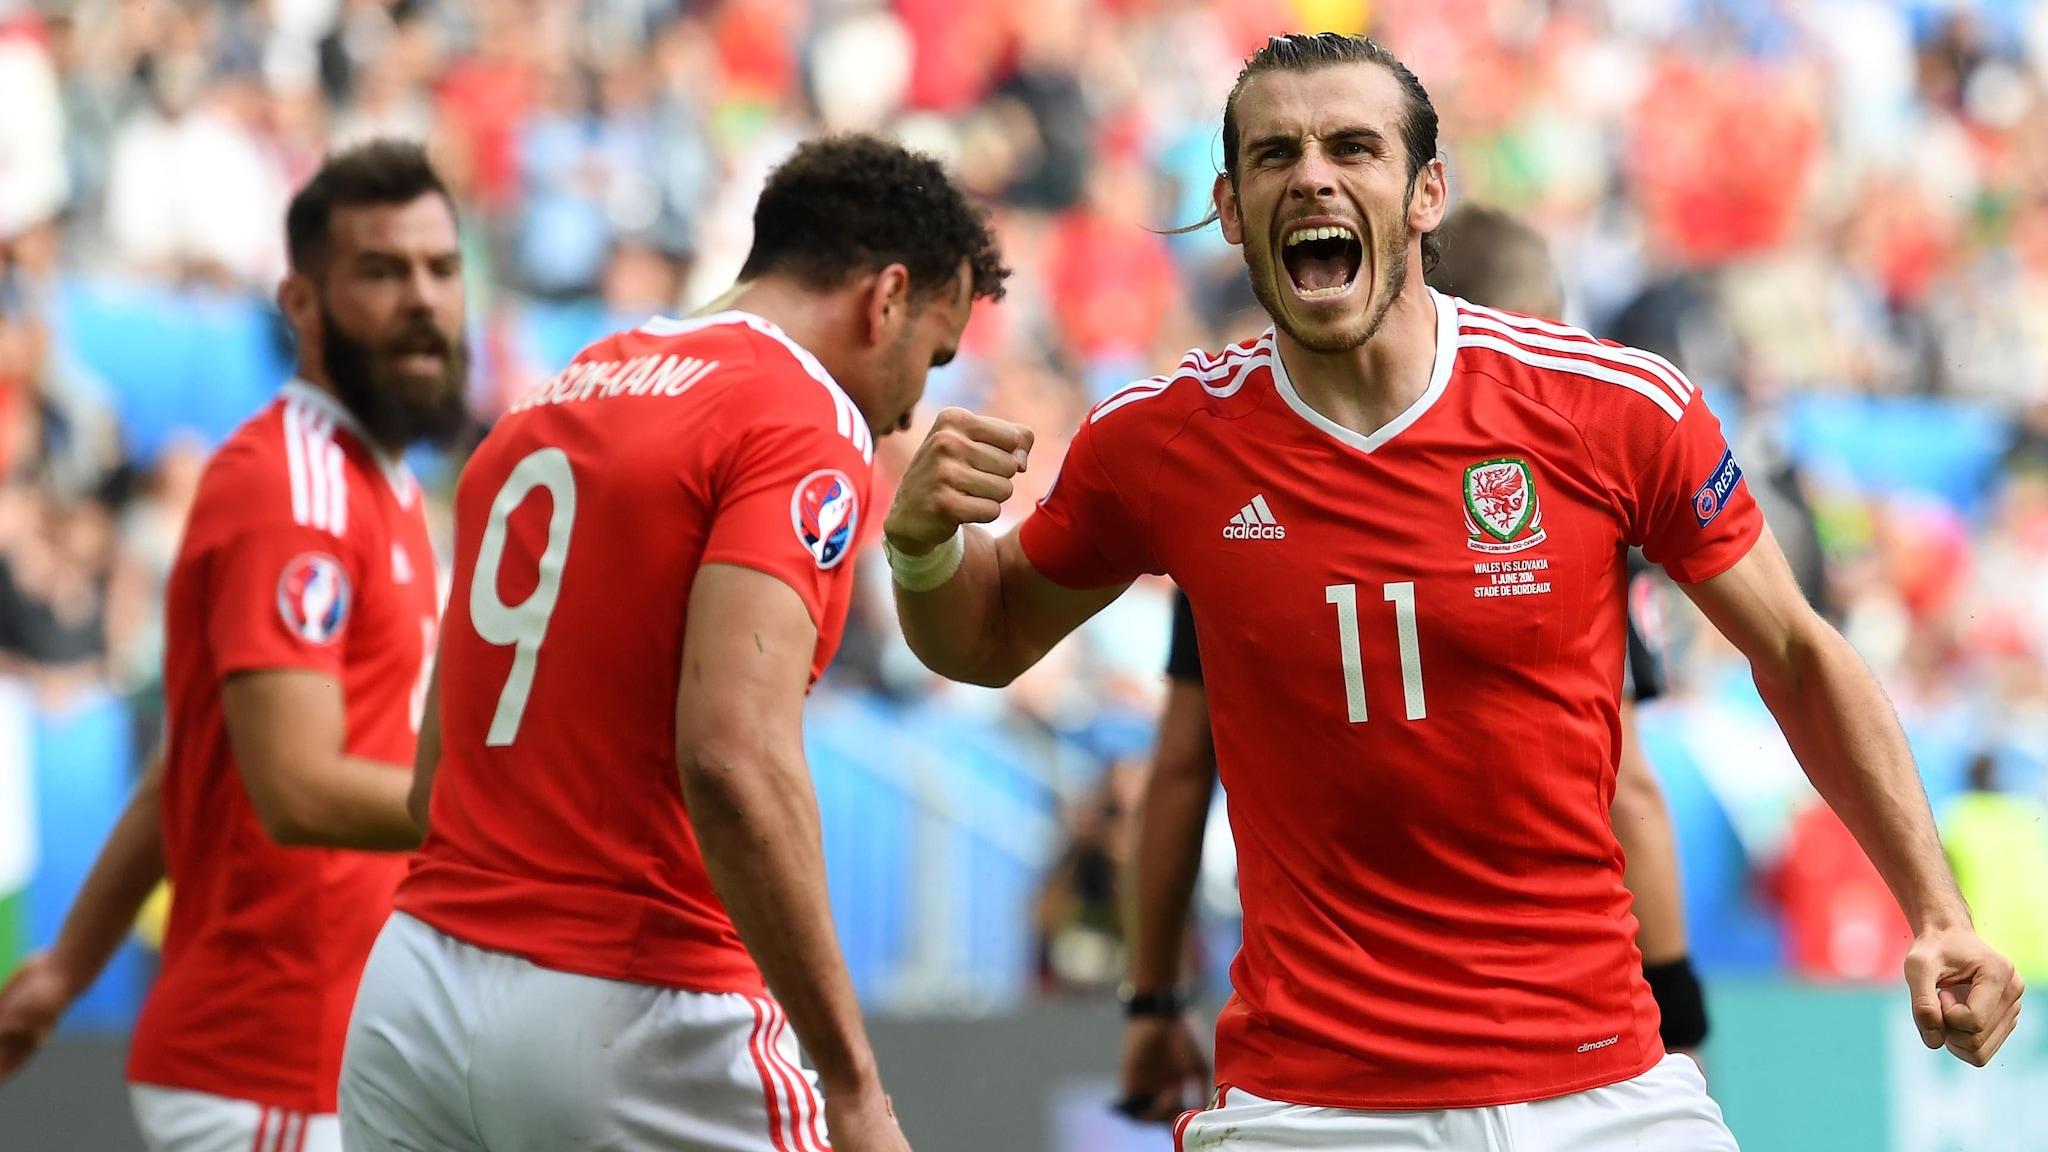 sinav: uefa euro 2016